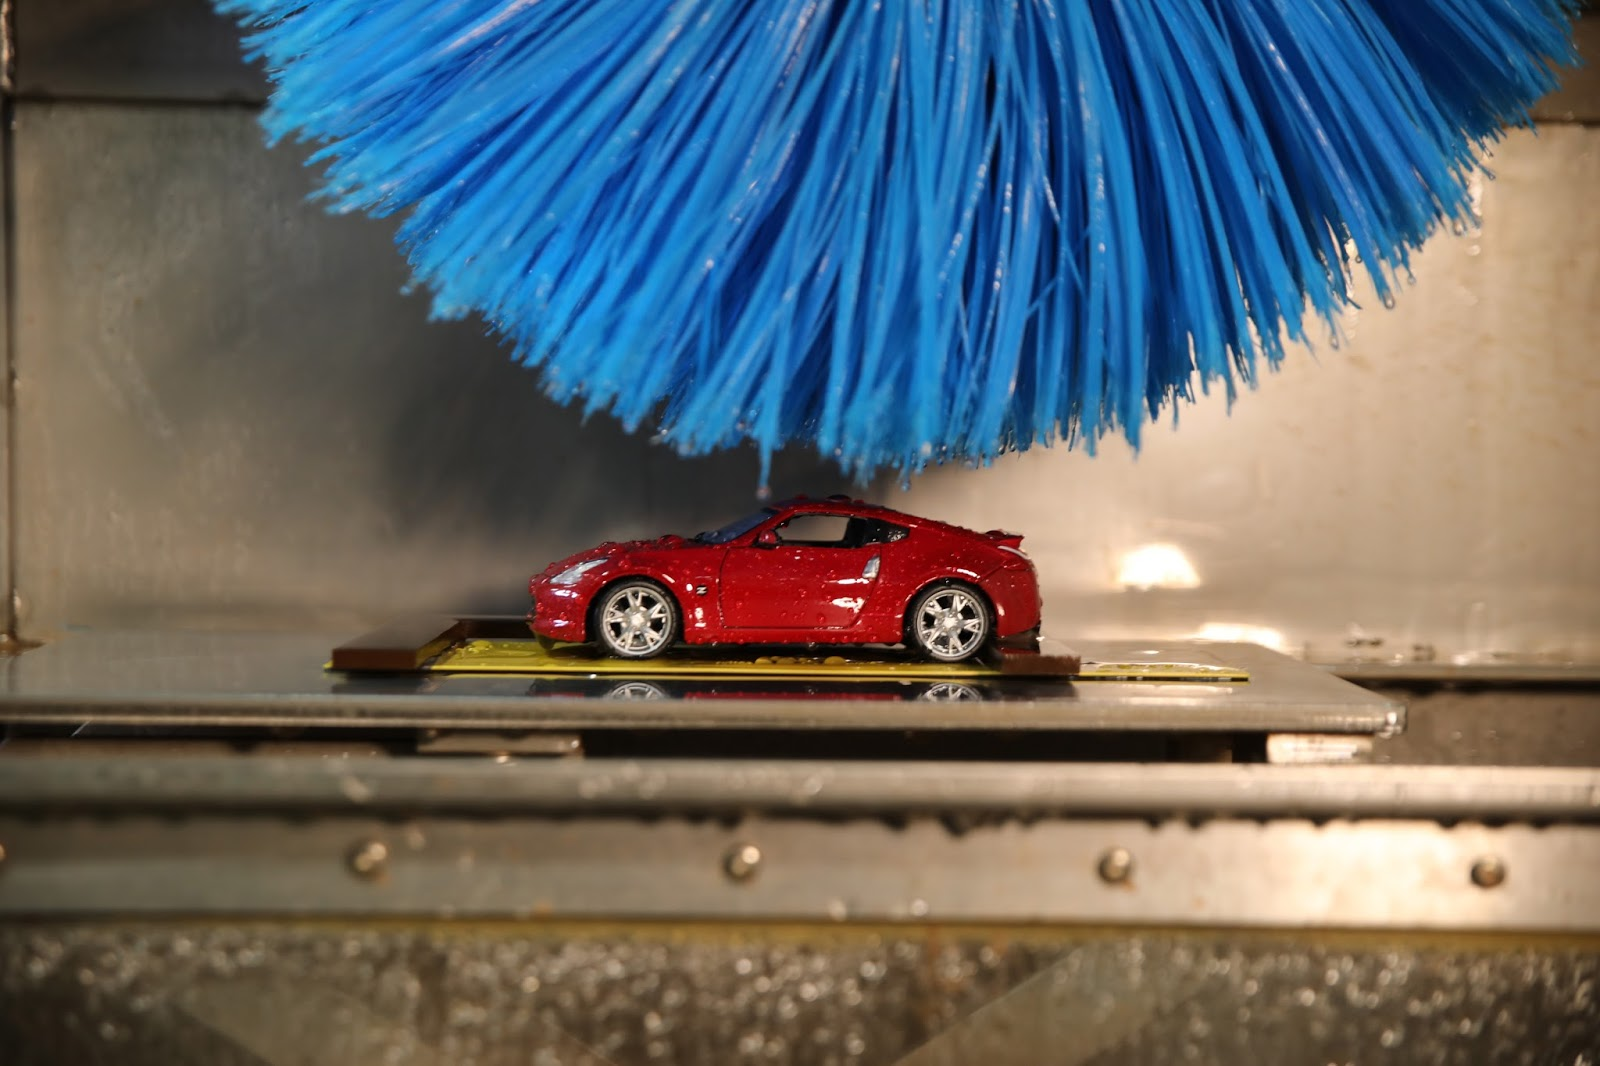 Nissan Car Wash Photo 2 Πώς δοκιμάζει την αντοχή των χρωμάτων της η Nissan Nissan, Nissan 370Z, video, videos, βίντεο, Τεχνολογία